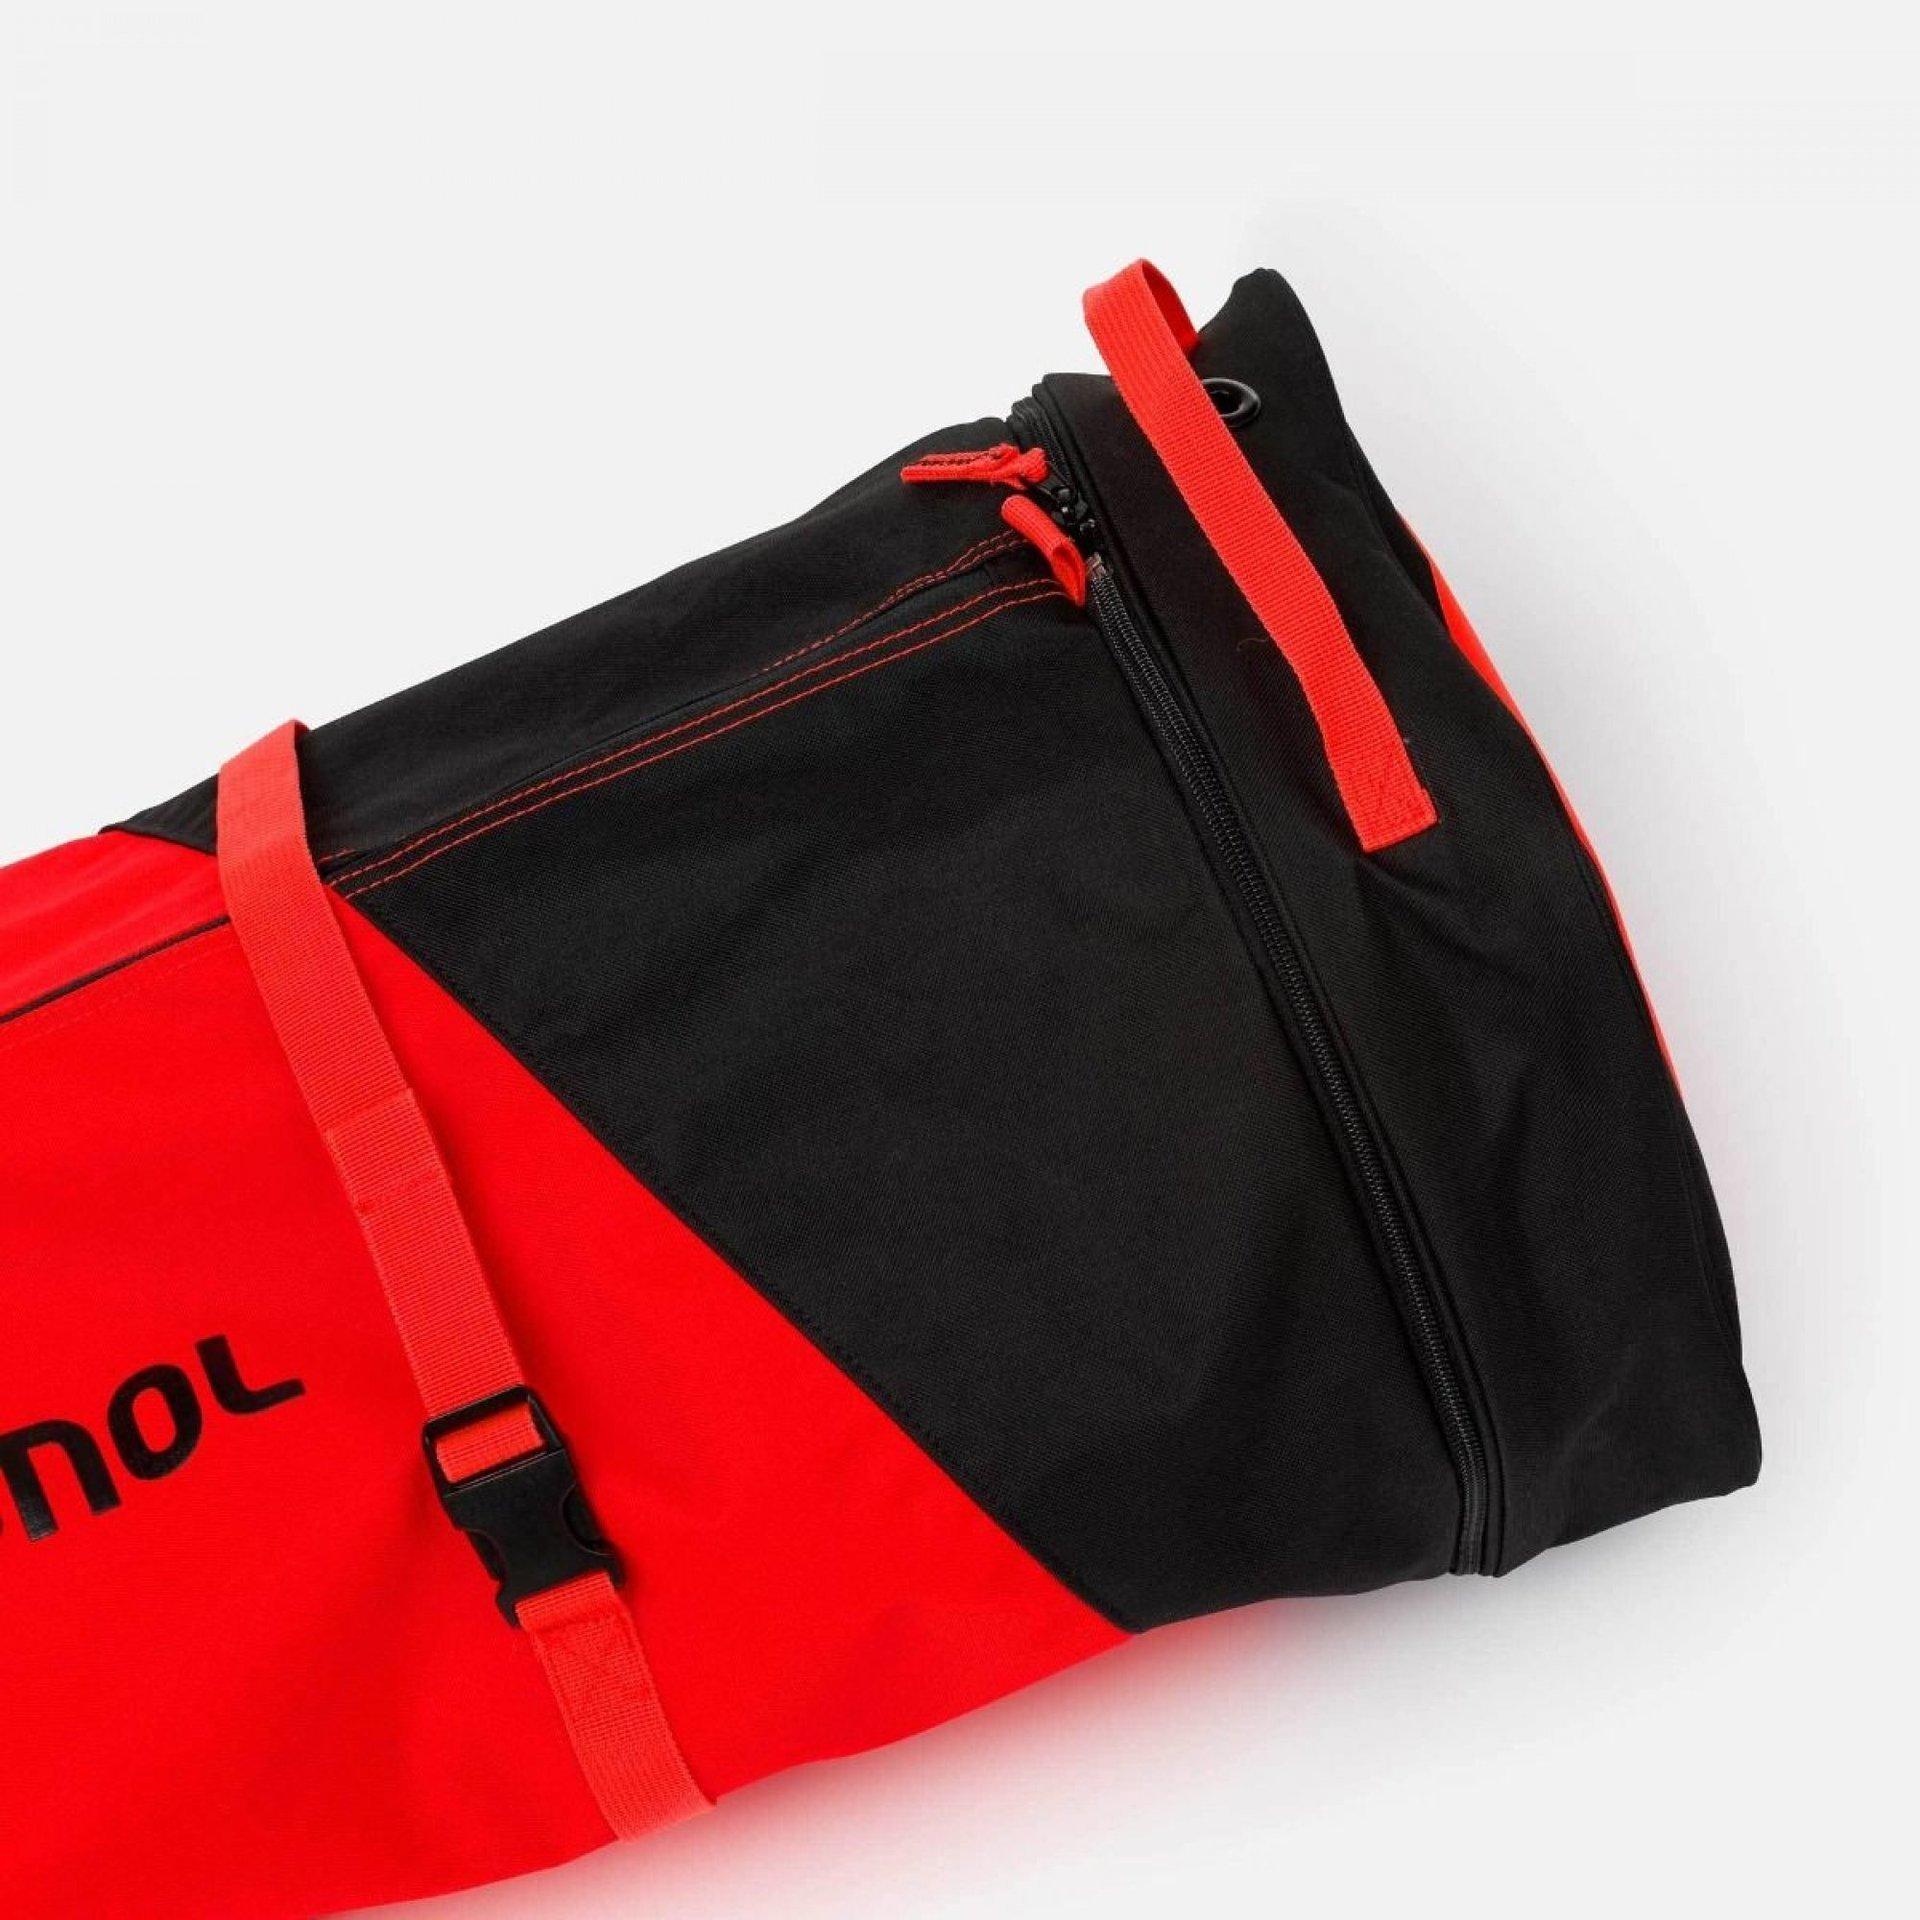 POKROWIEC NA NARTY ROSSIGNOL HERO JR SKI BAG 170 CM RED 4